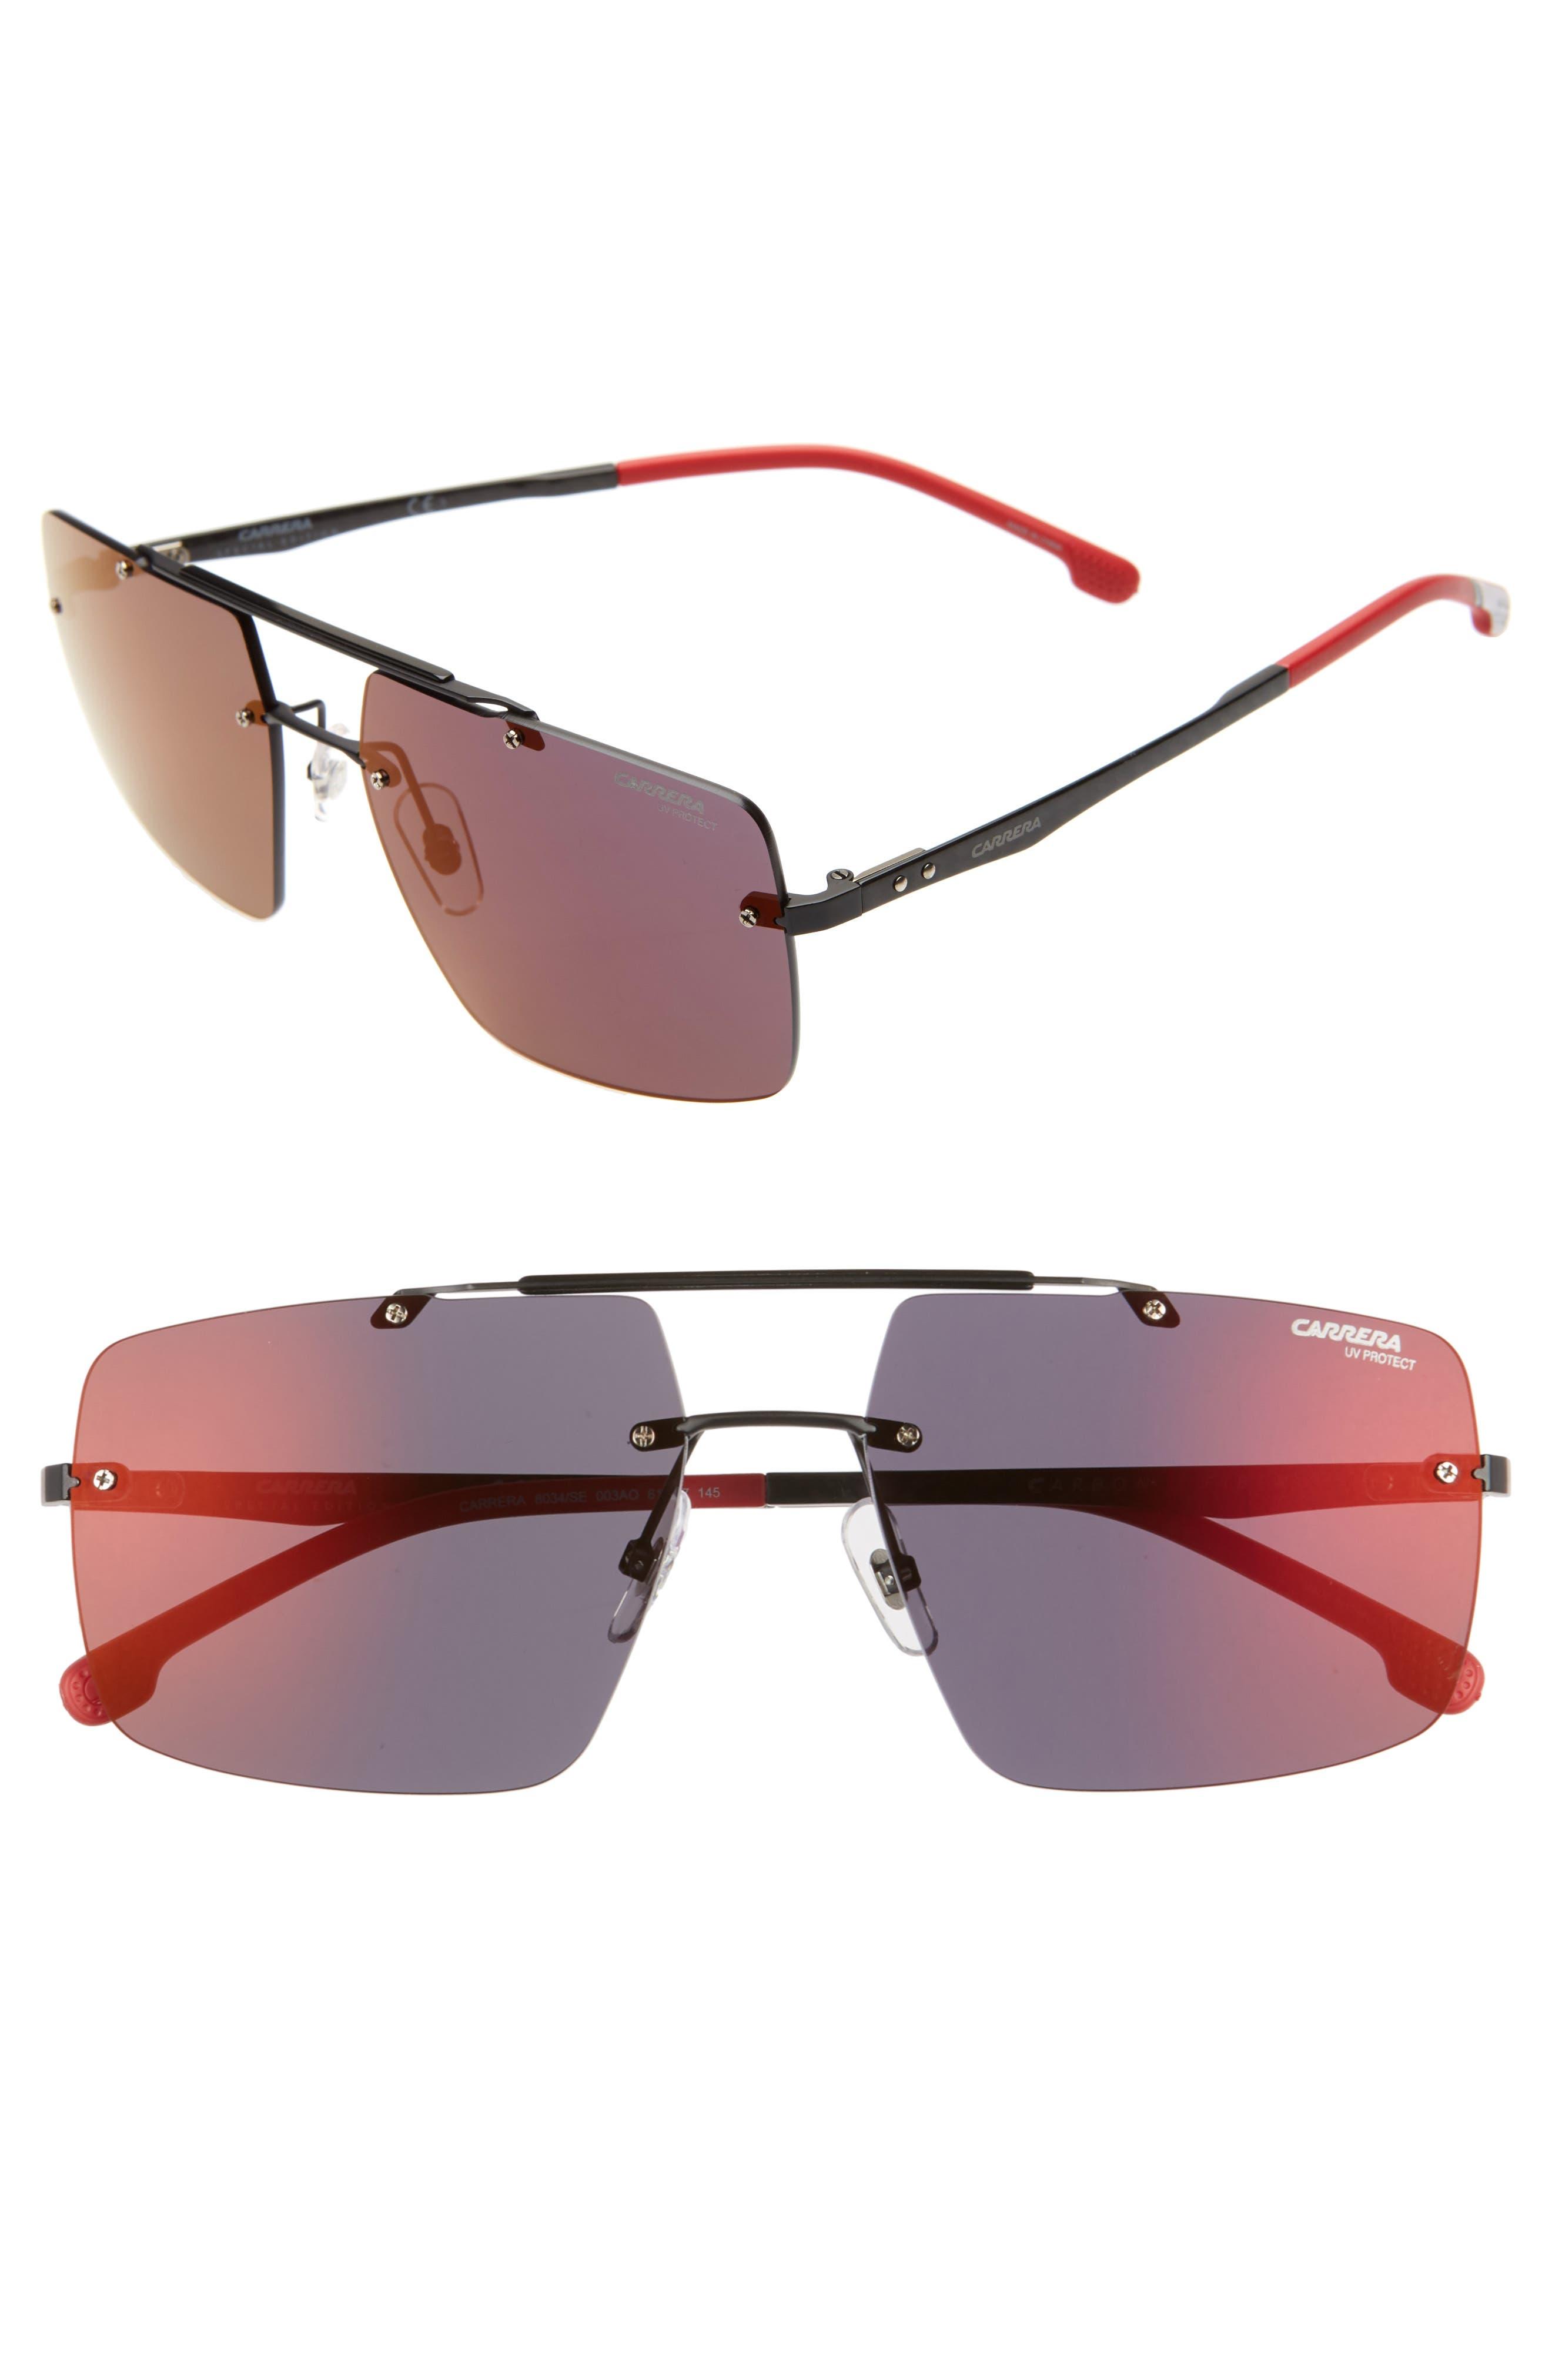 55mm Polarized Tinted Rimless Navigator Sunglasses